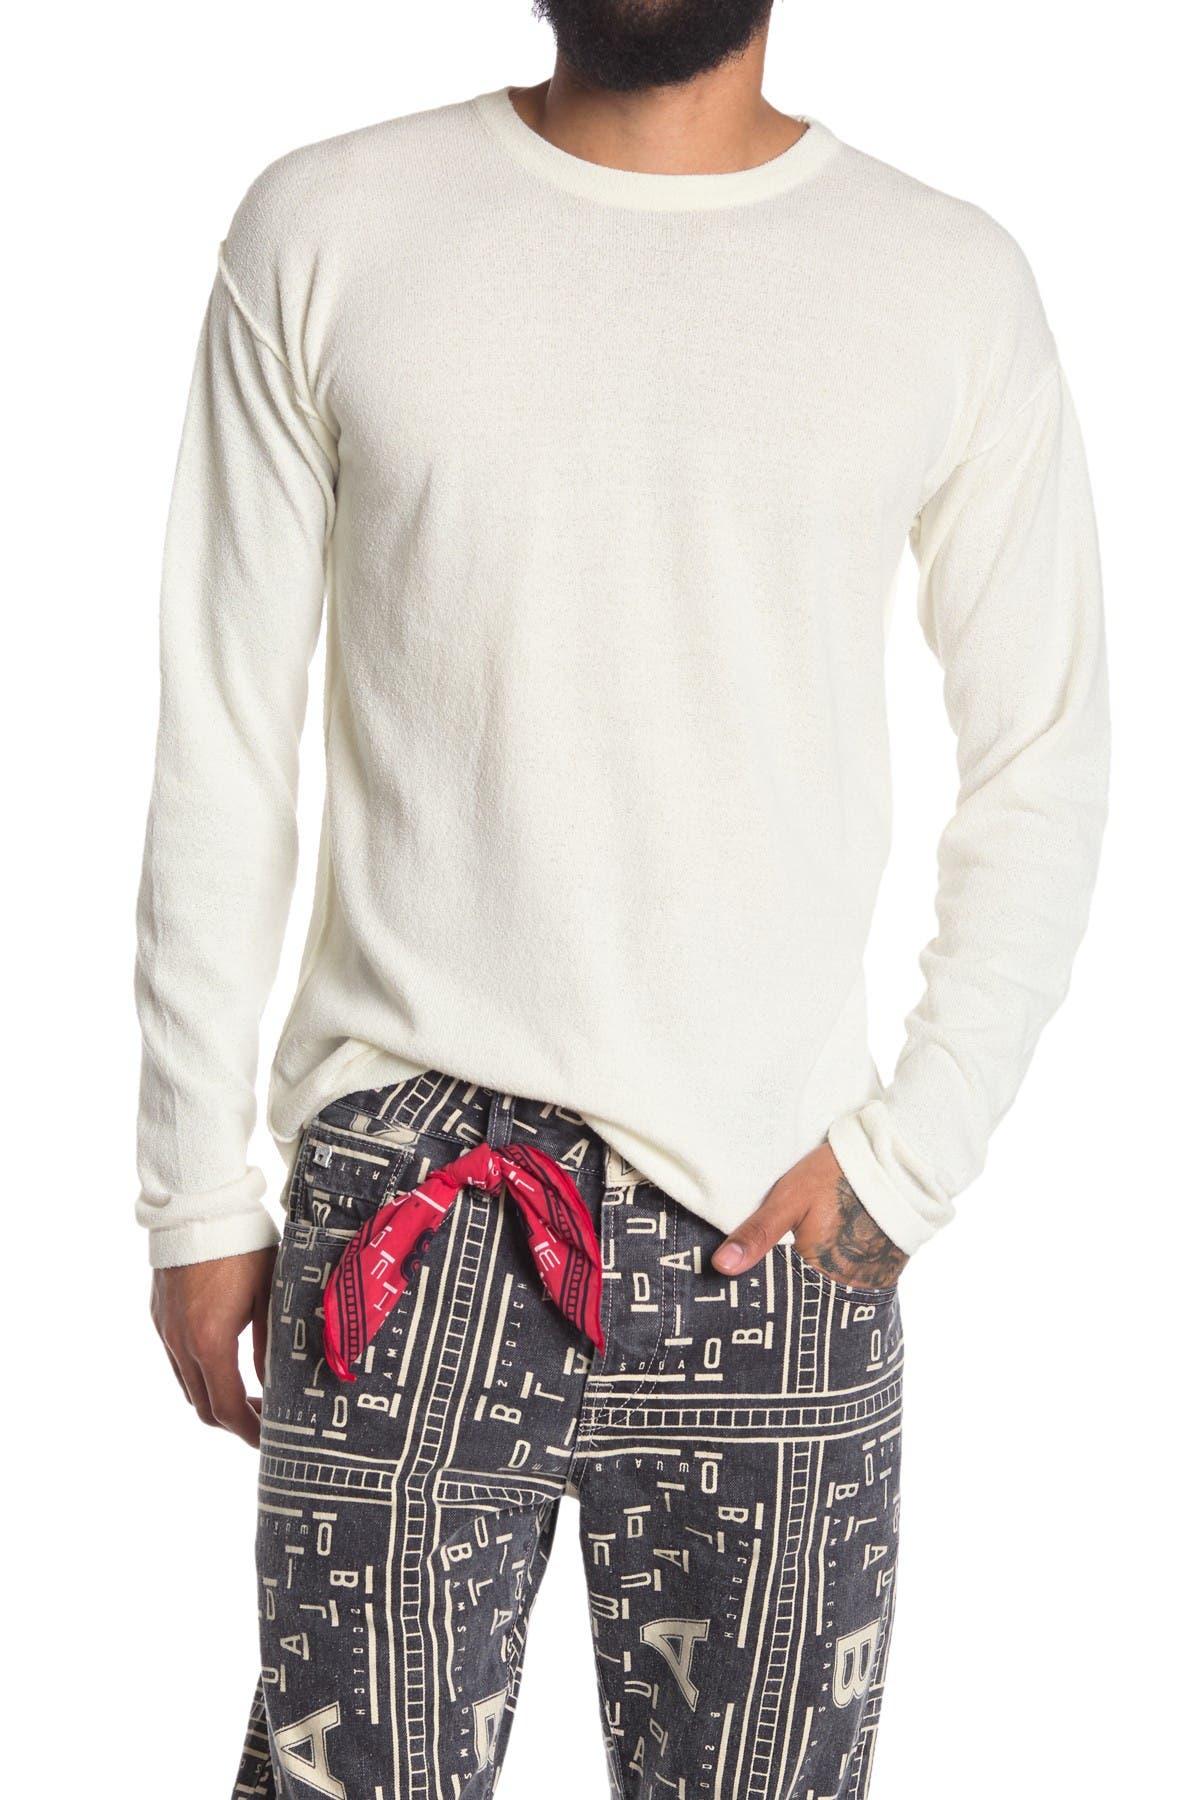 Image of Scotch & Soda Long Sleeve Crew Neck T-Shirt